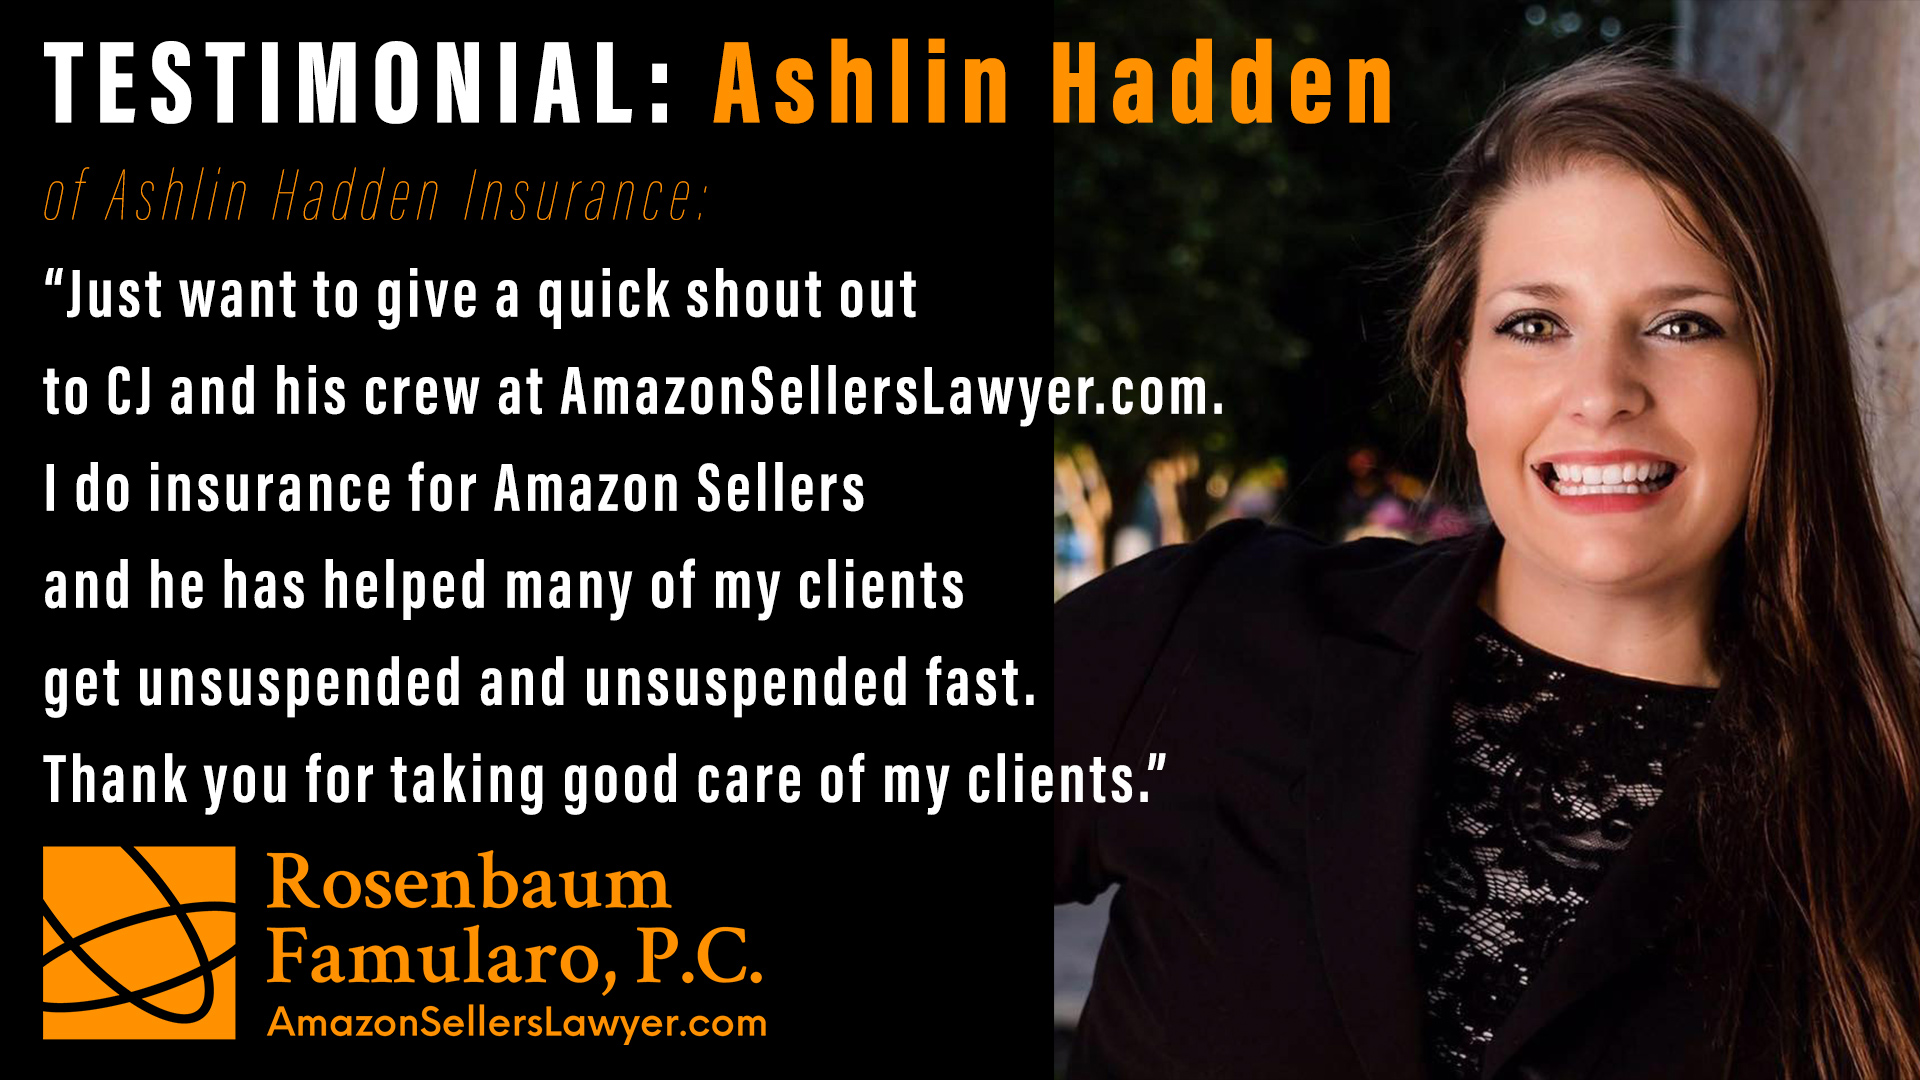 Testimonial - Ashlin Hadden Insurance -insurance for Amazon Sellers